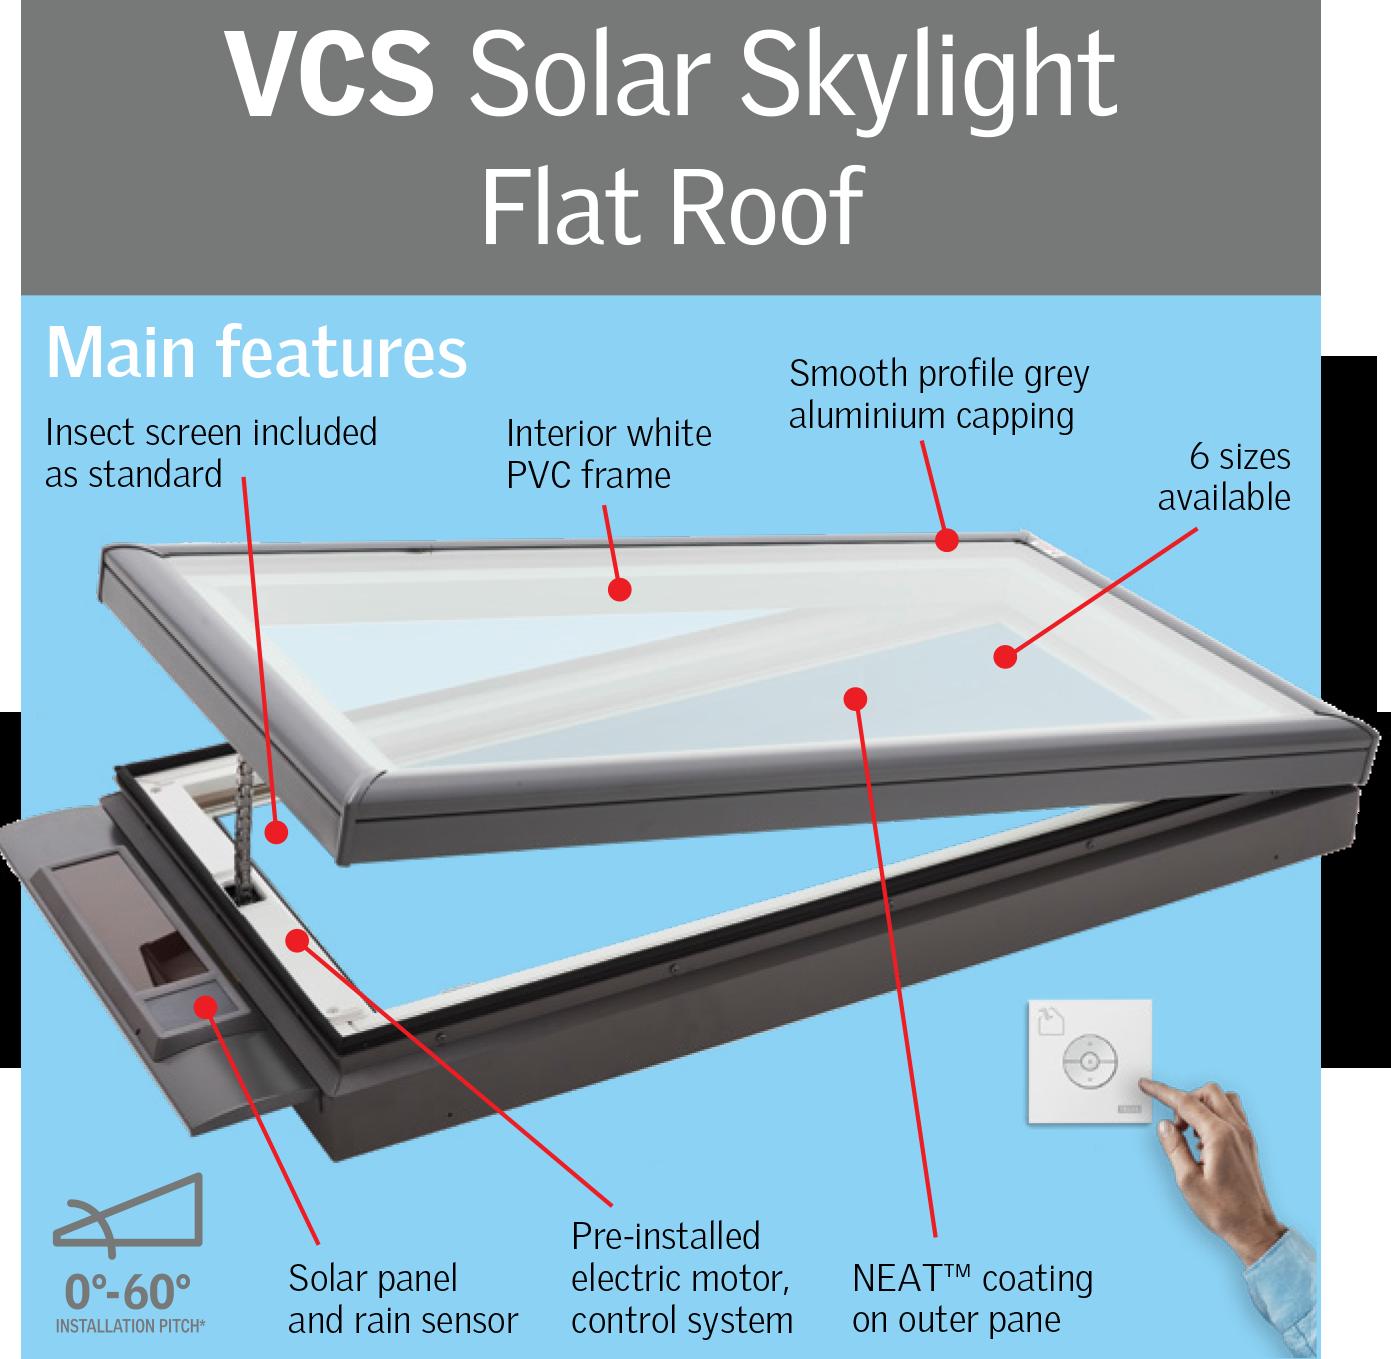 VCS-Solar-Skylight-Flat-Roof